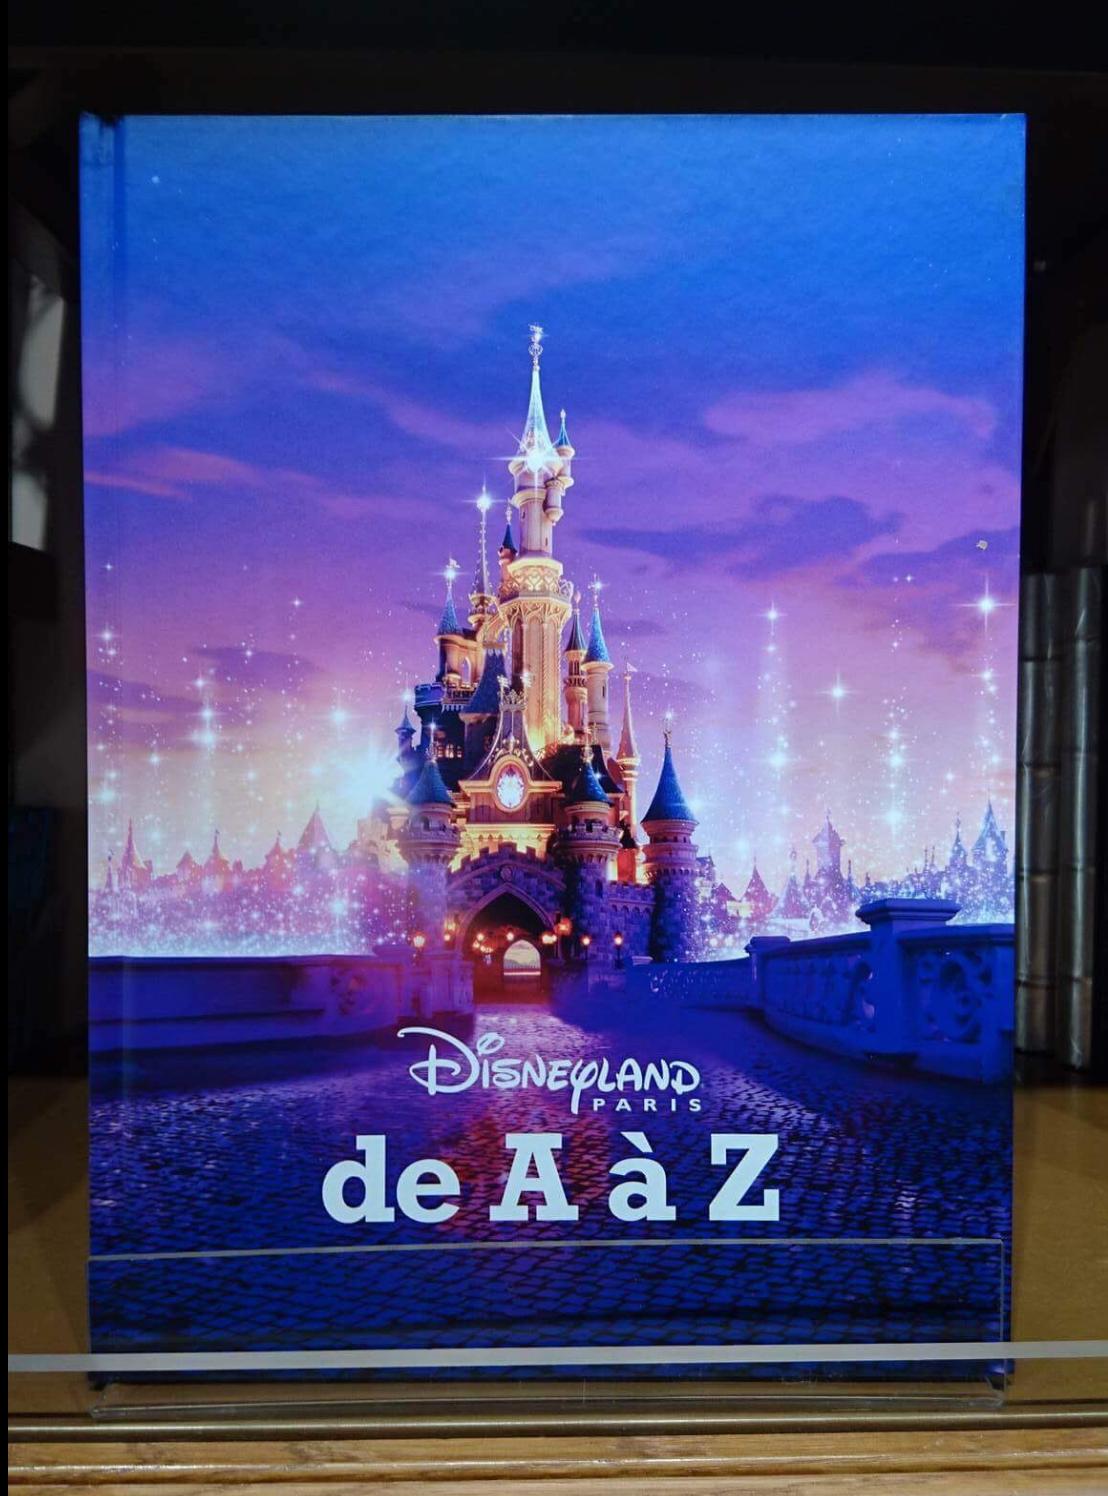 Presentation Du Merchandising Des 25 Ans De Disneyland Paris